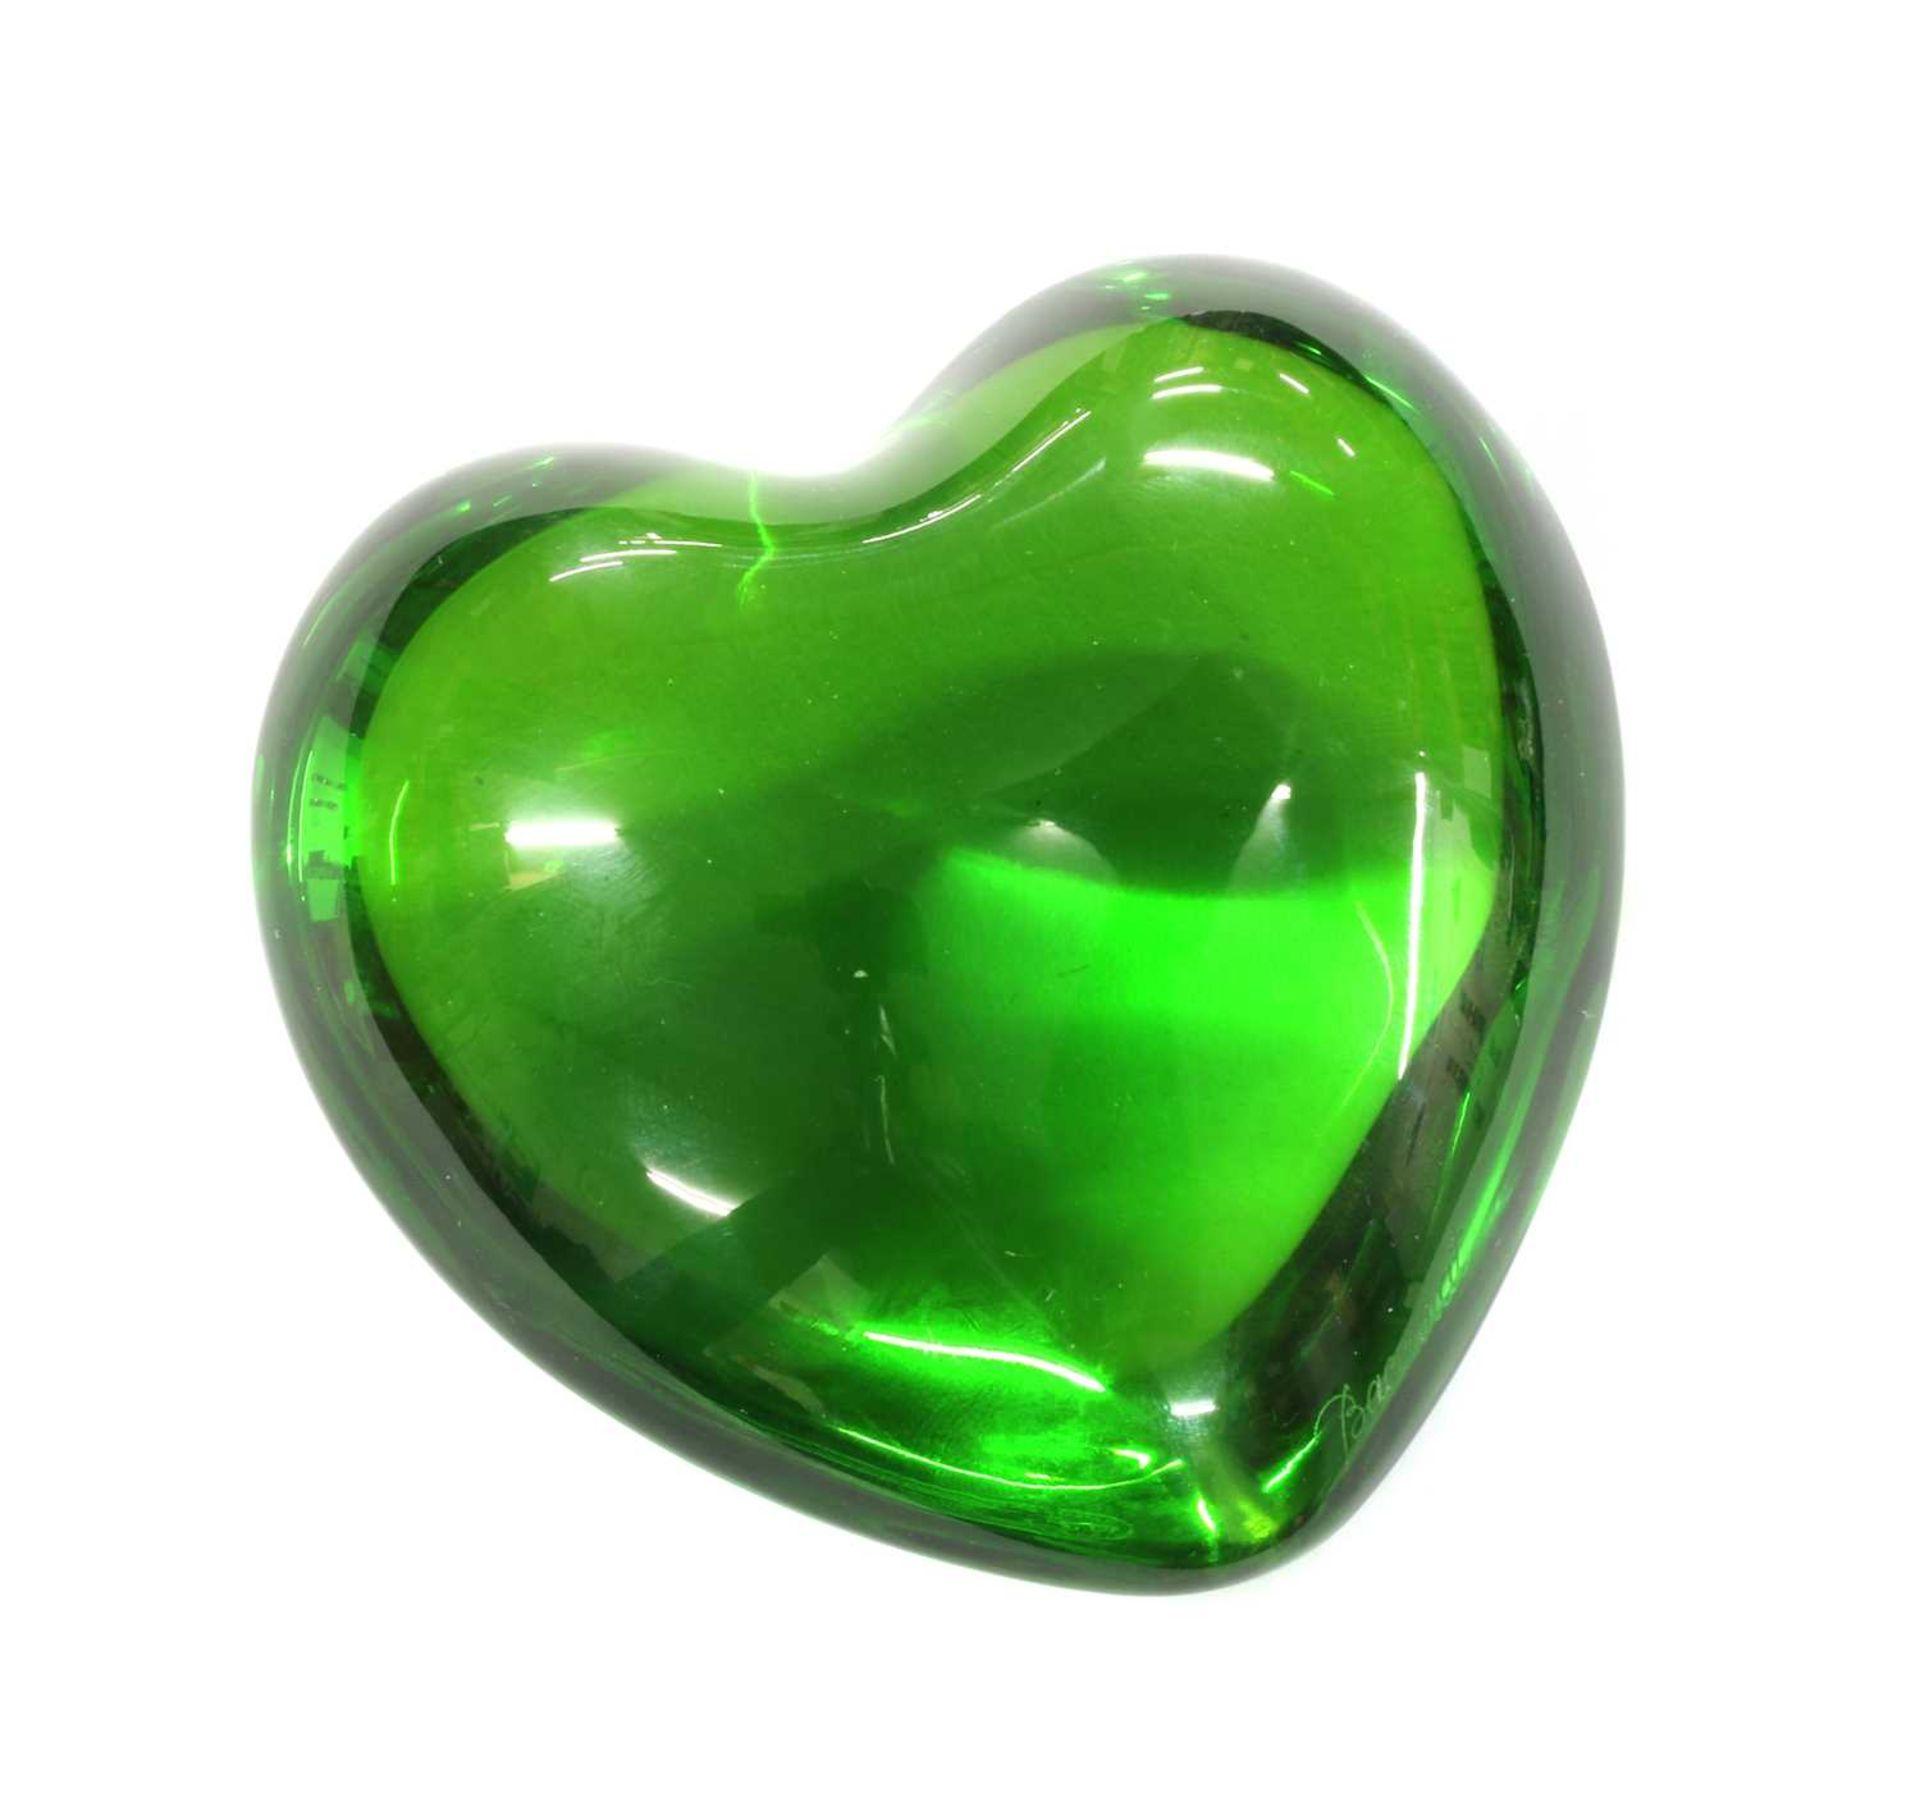 A green glass Baccarat paperweight,